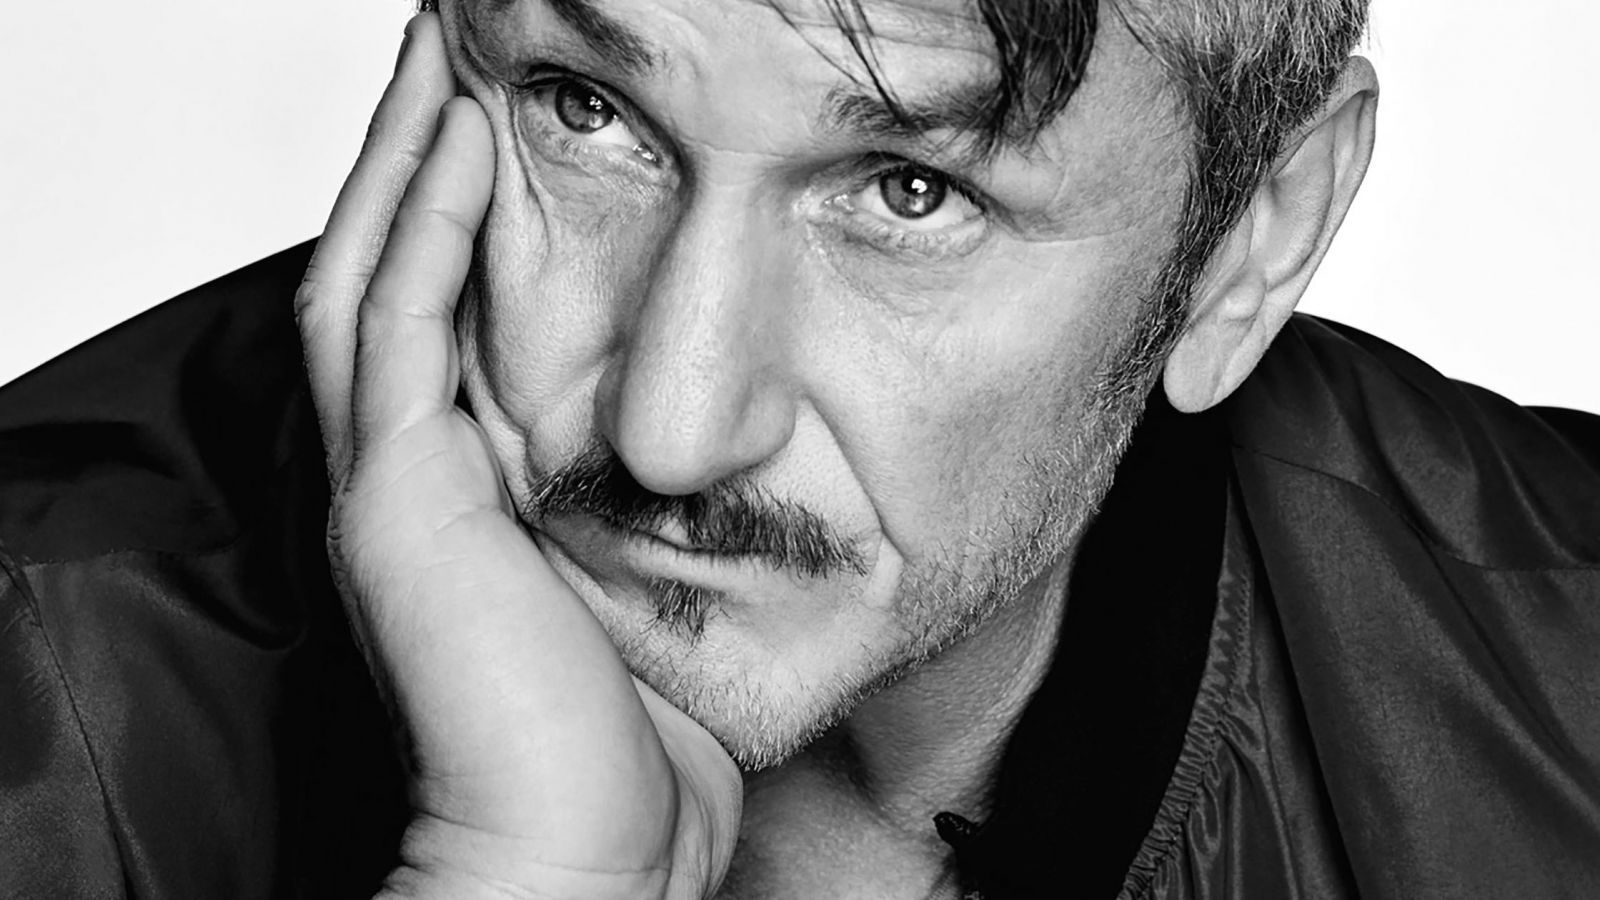 Sean Penn: Μυστικός γάμος για τον ηθοποιό – Ποια είναι η 28χρονη σύντροφός του [pics]